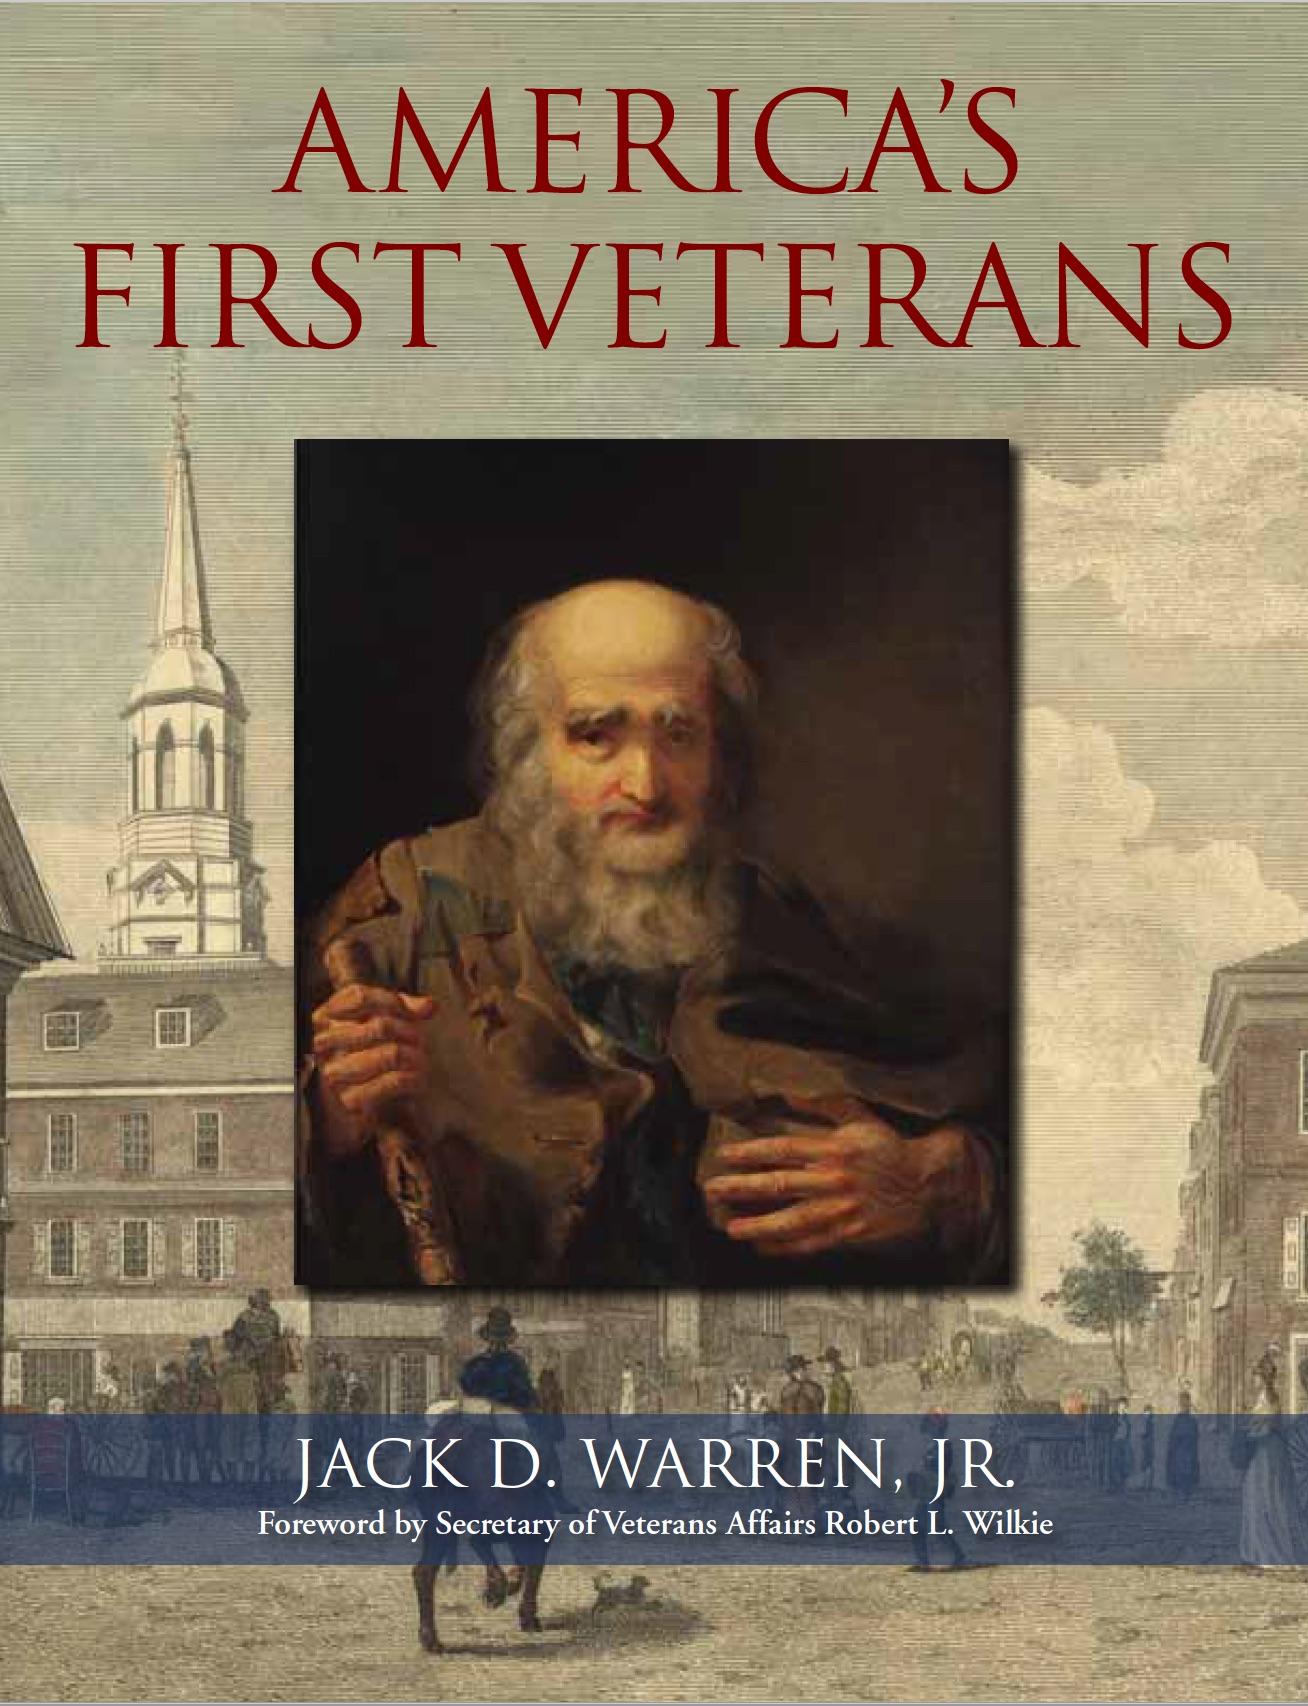 Pre-order America's First Veterans by Jack D. Warren, Jr.